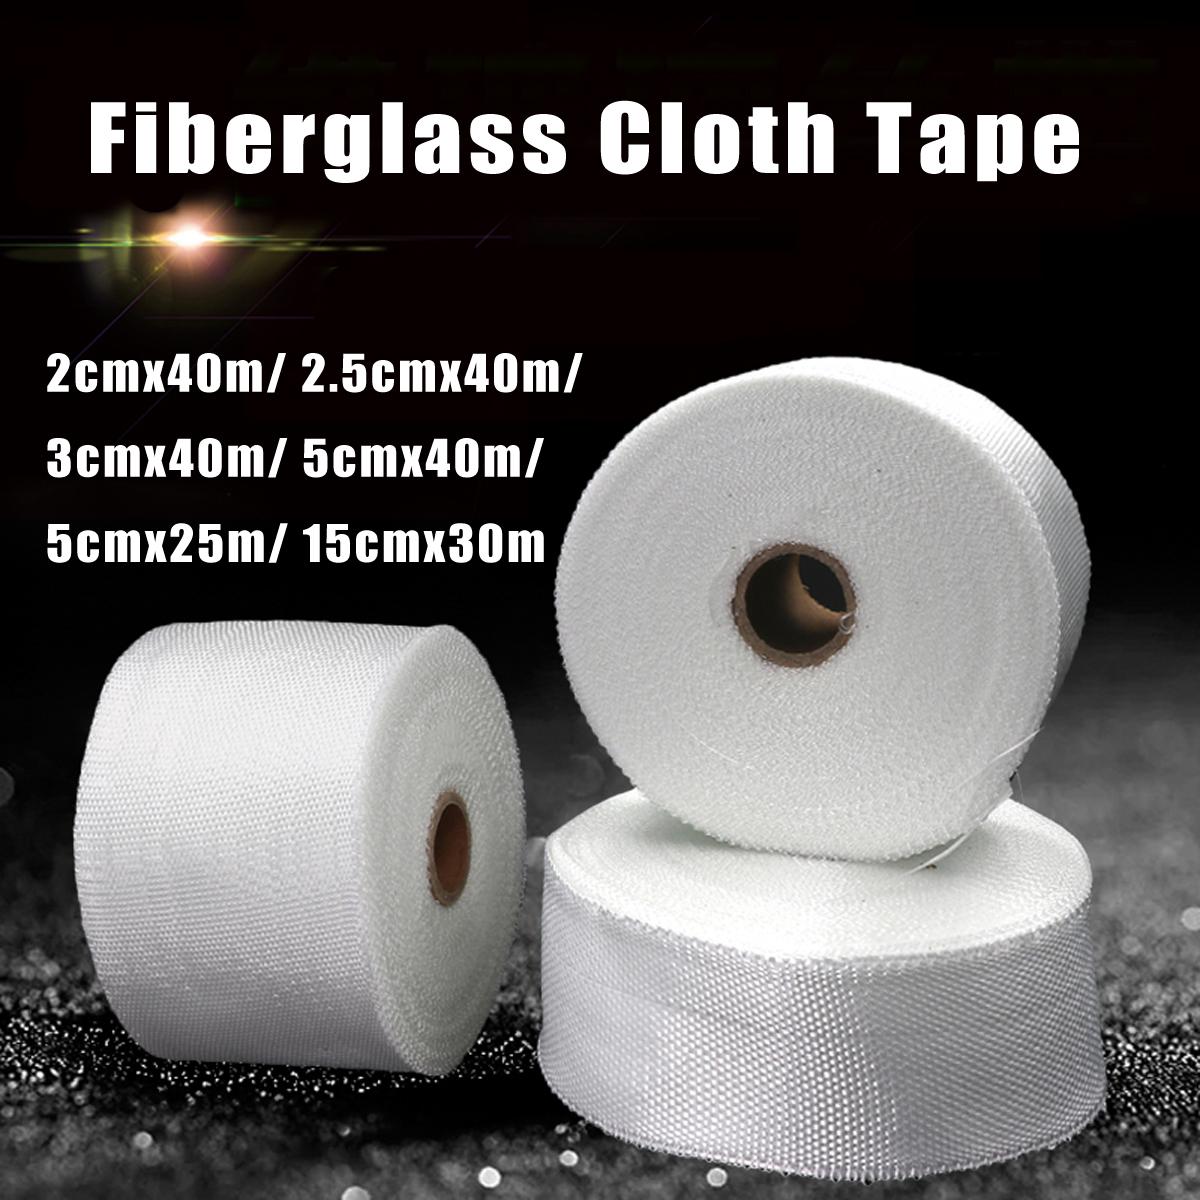 Fiberglass Cloth Tape Roll Glass Fiber Plain Weave Joint Strap Fabric Repair